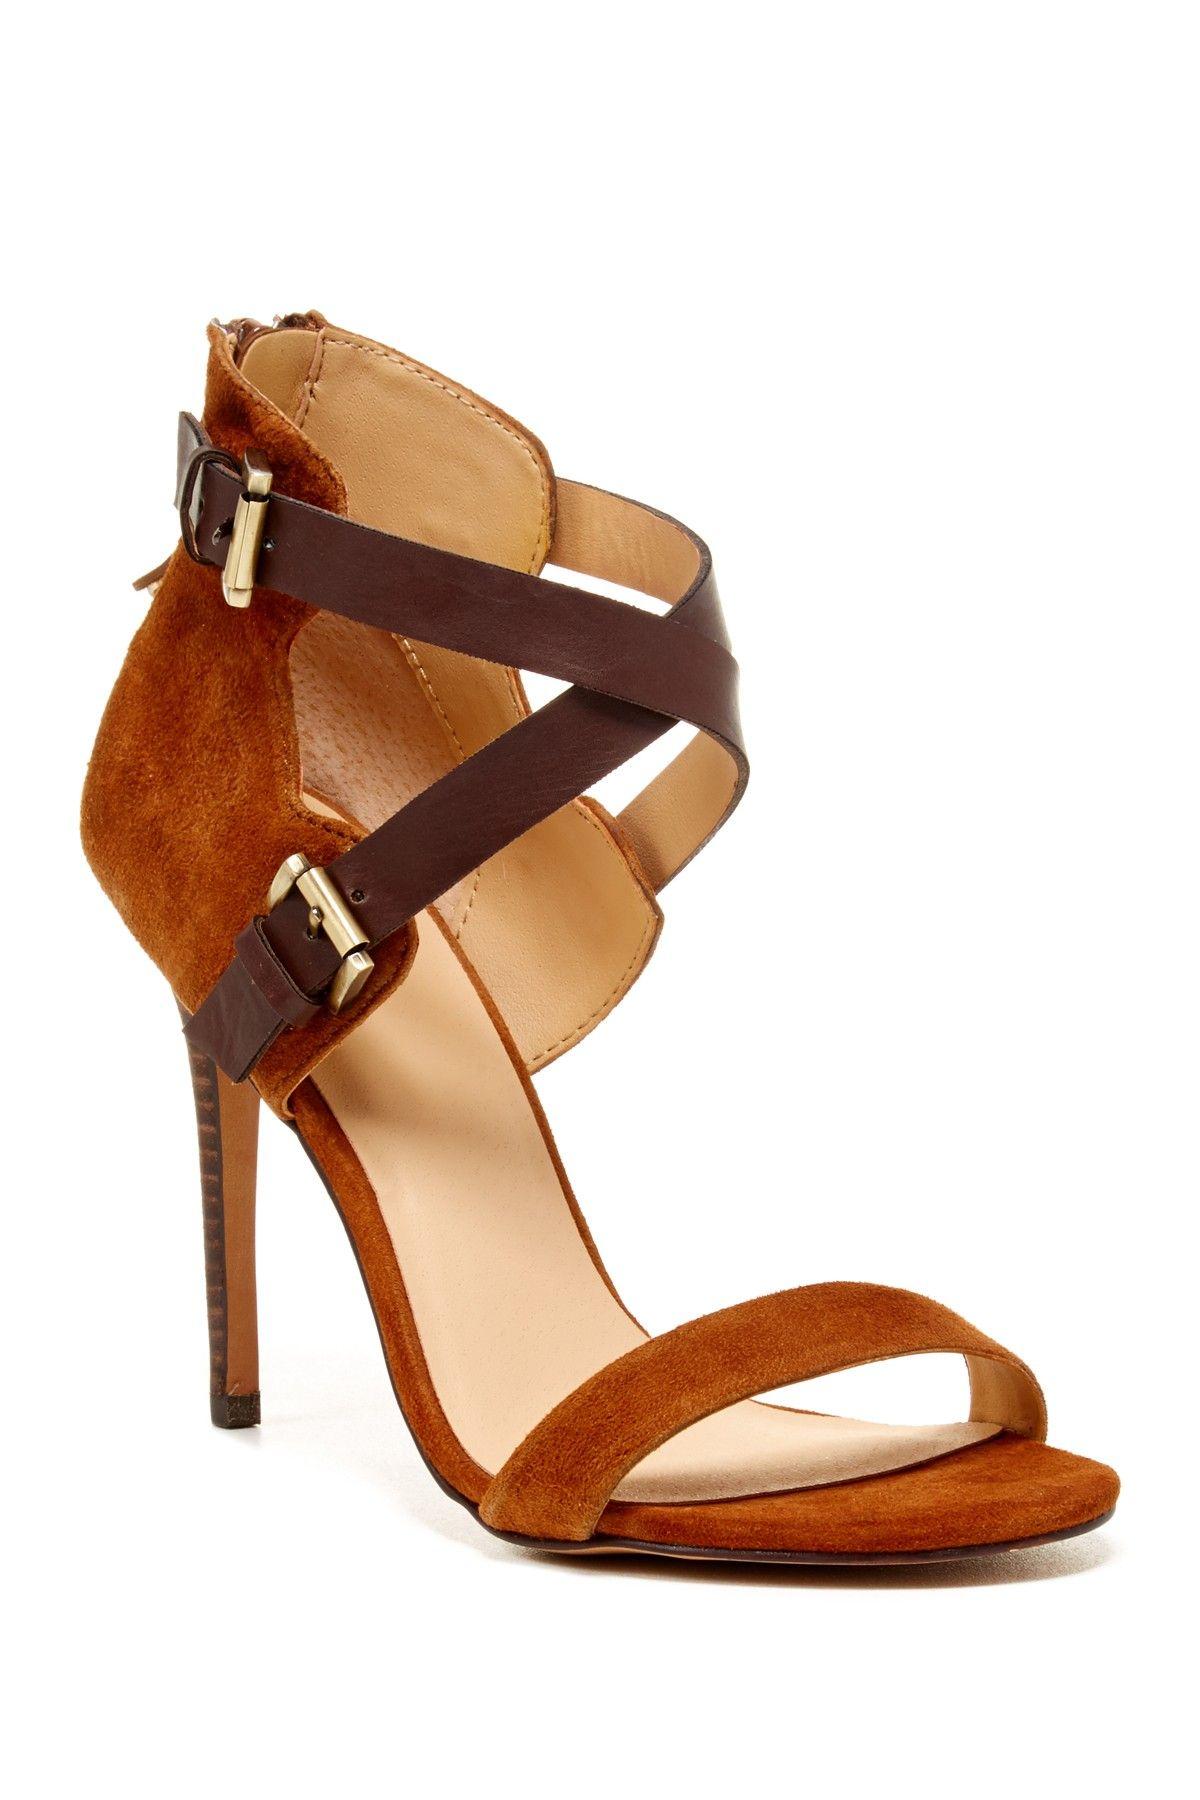 JOE'S JEANS - Morgan High Heel Sandal - I WANT!